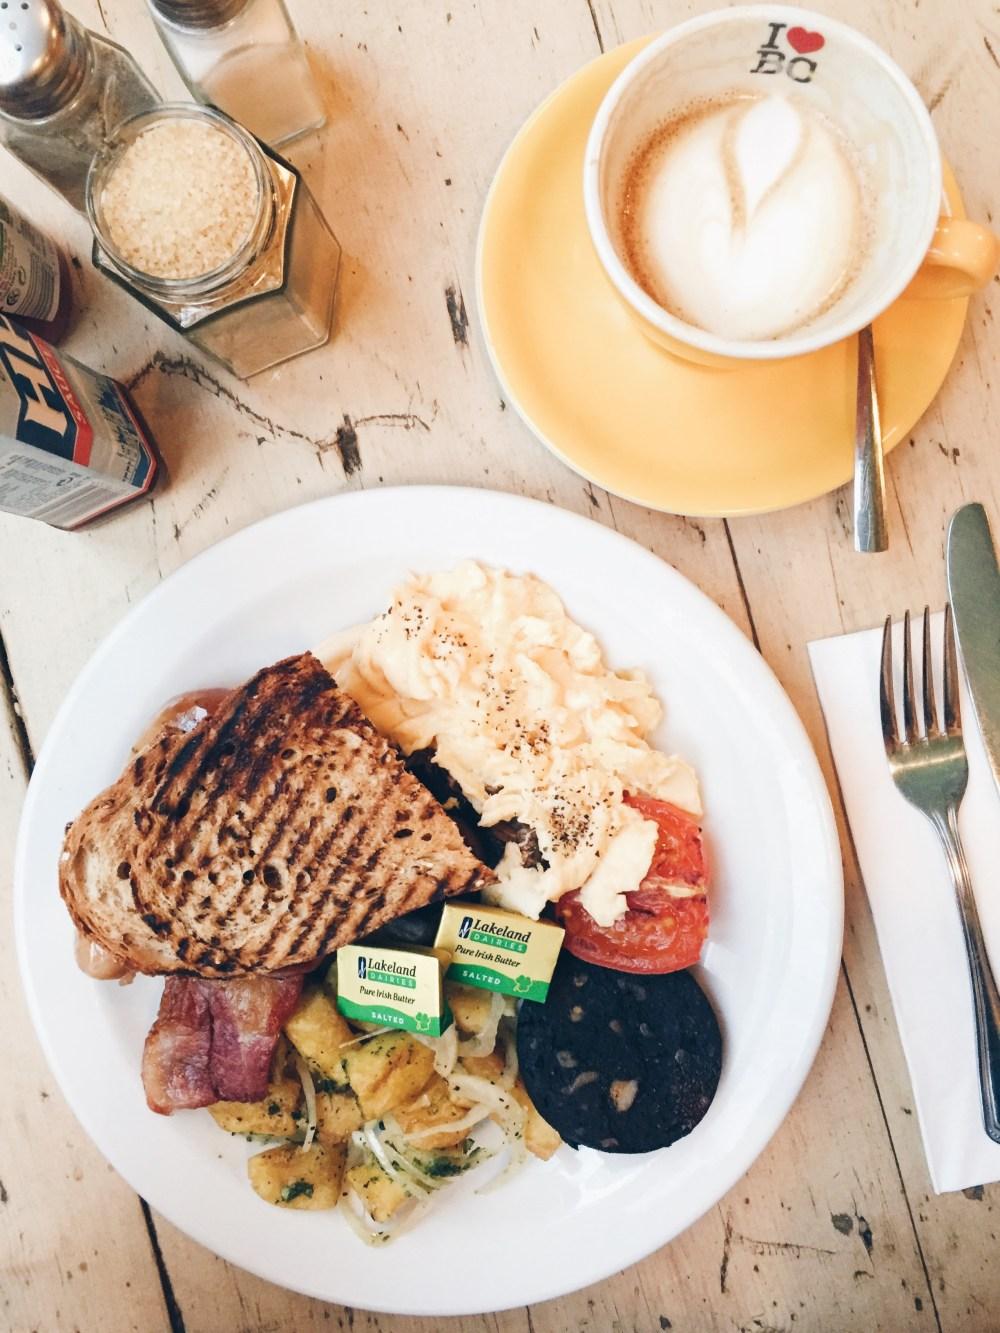 11 Dec 2016: The Full Monty @ The Breakfast Club | London, England